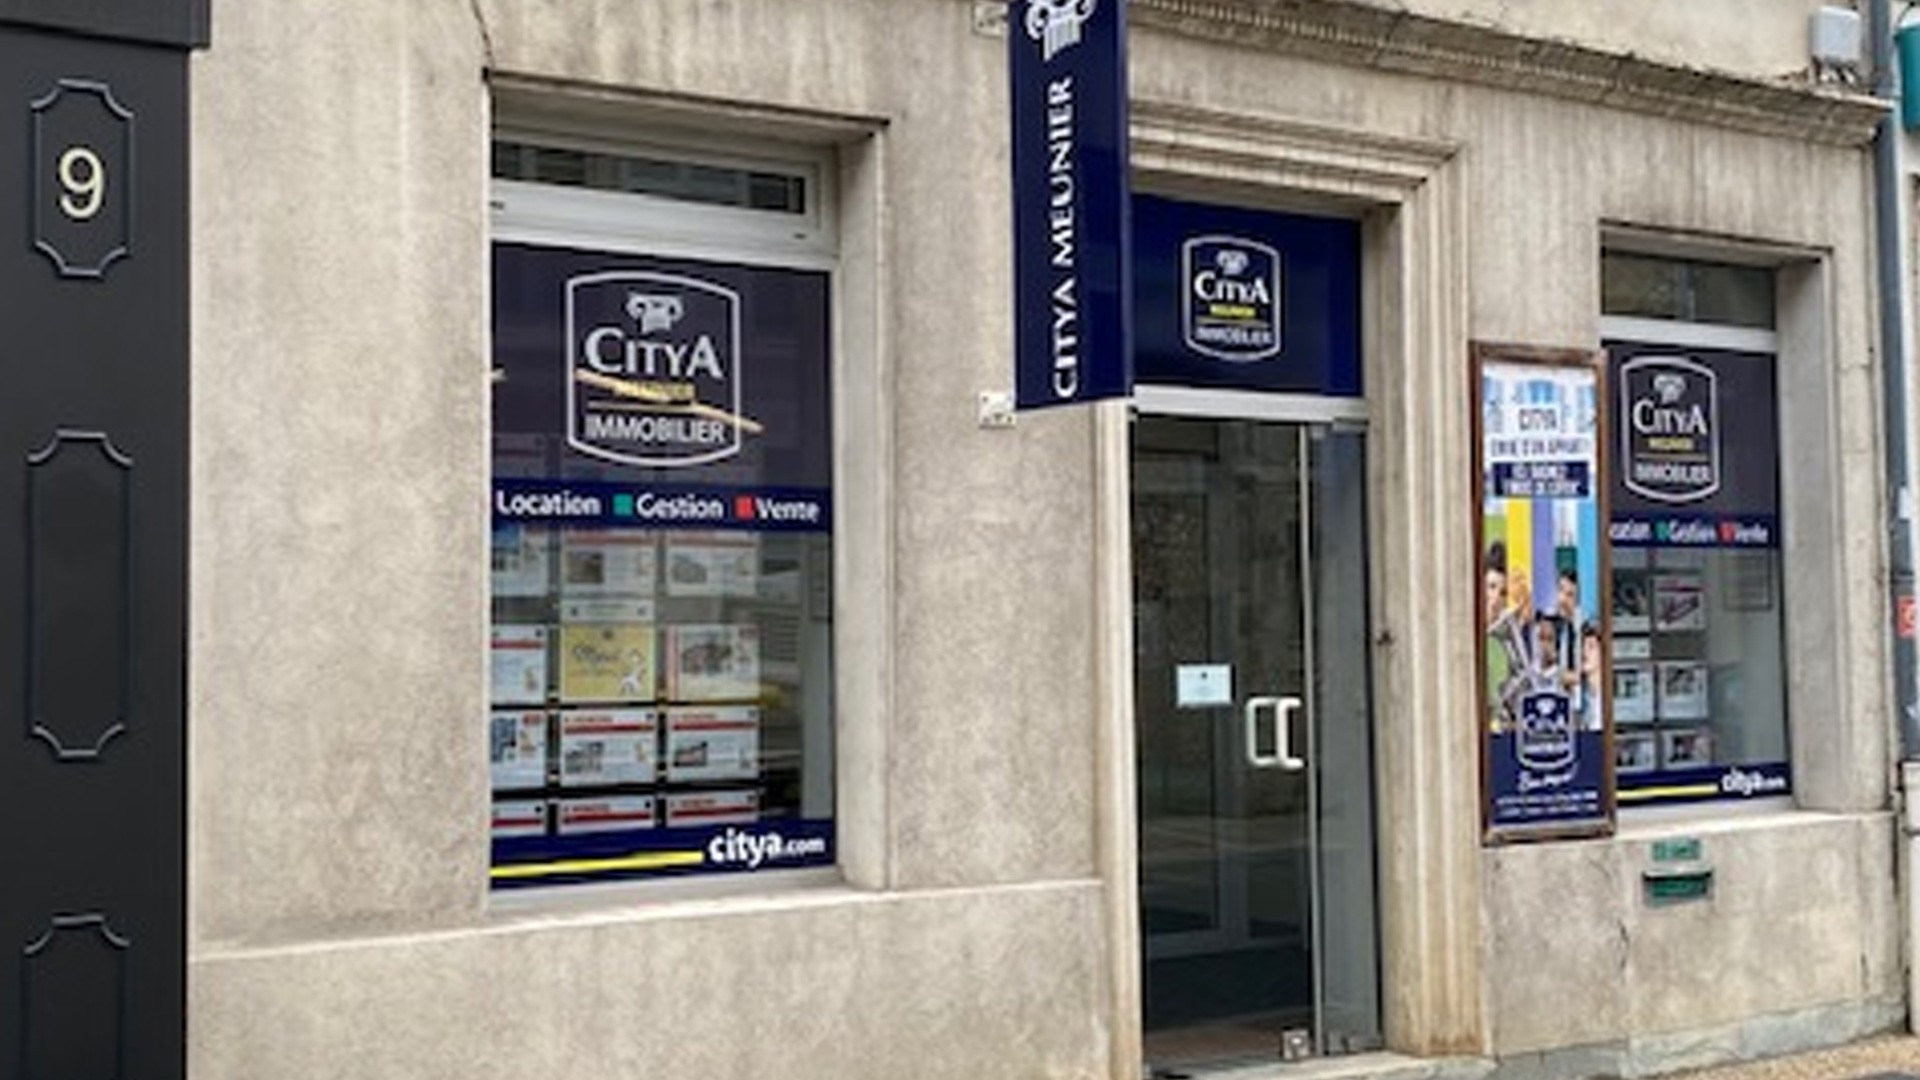 Agence immo Citya Immobilier Meunier